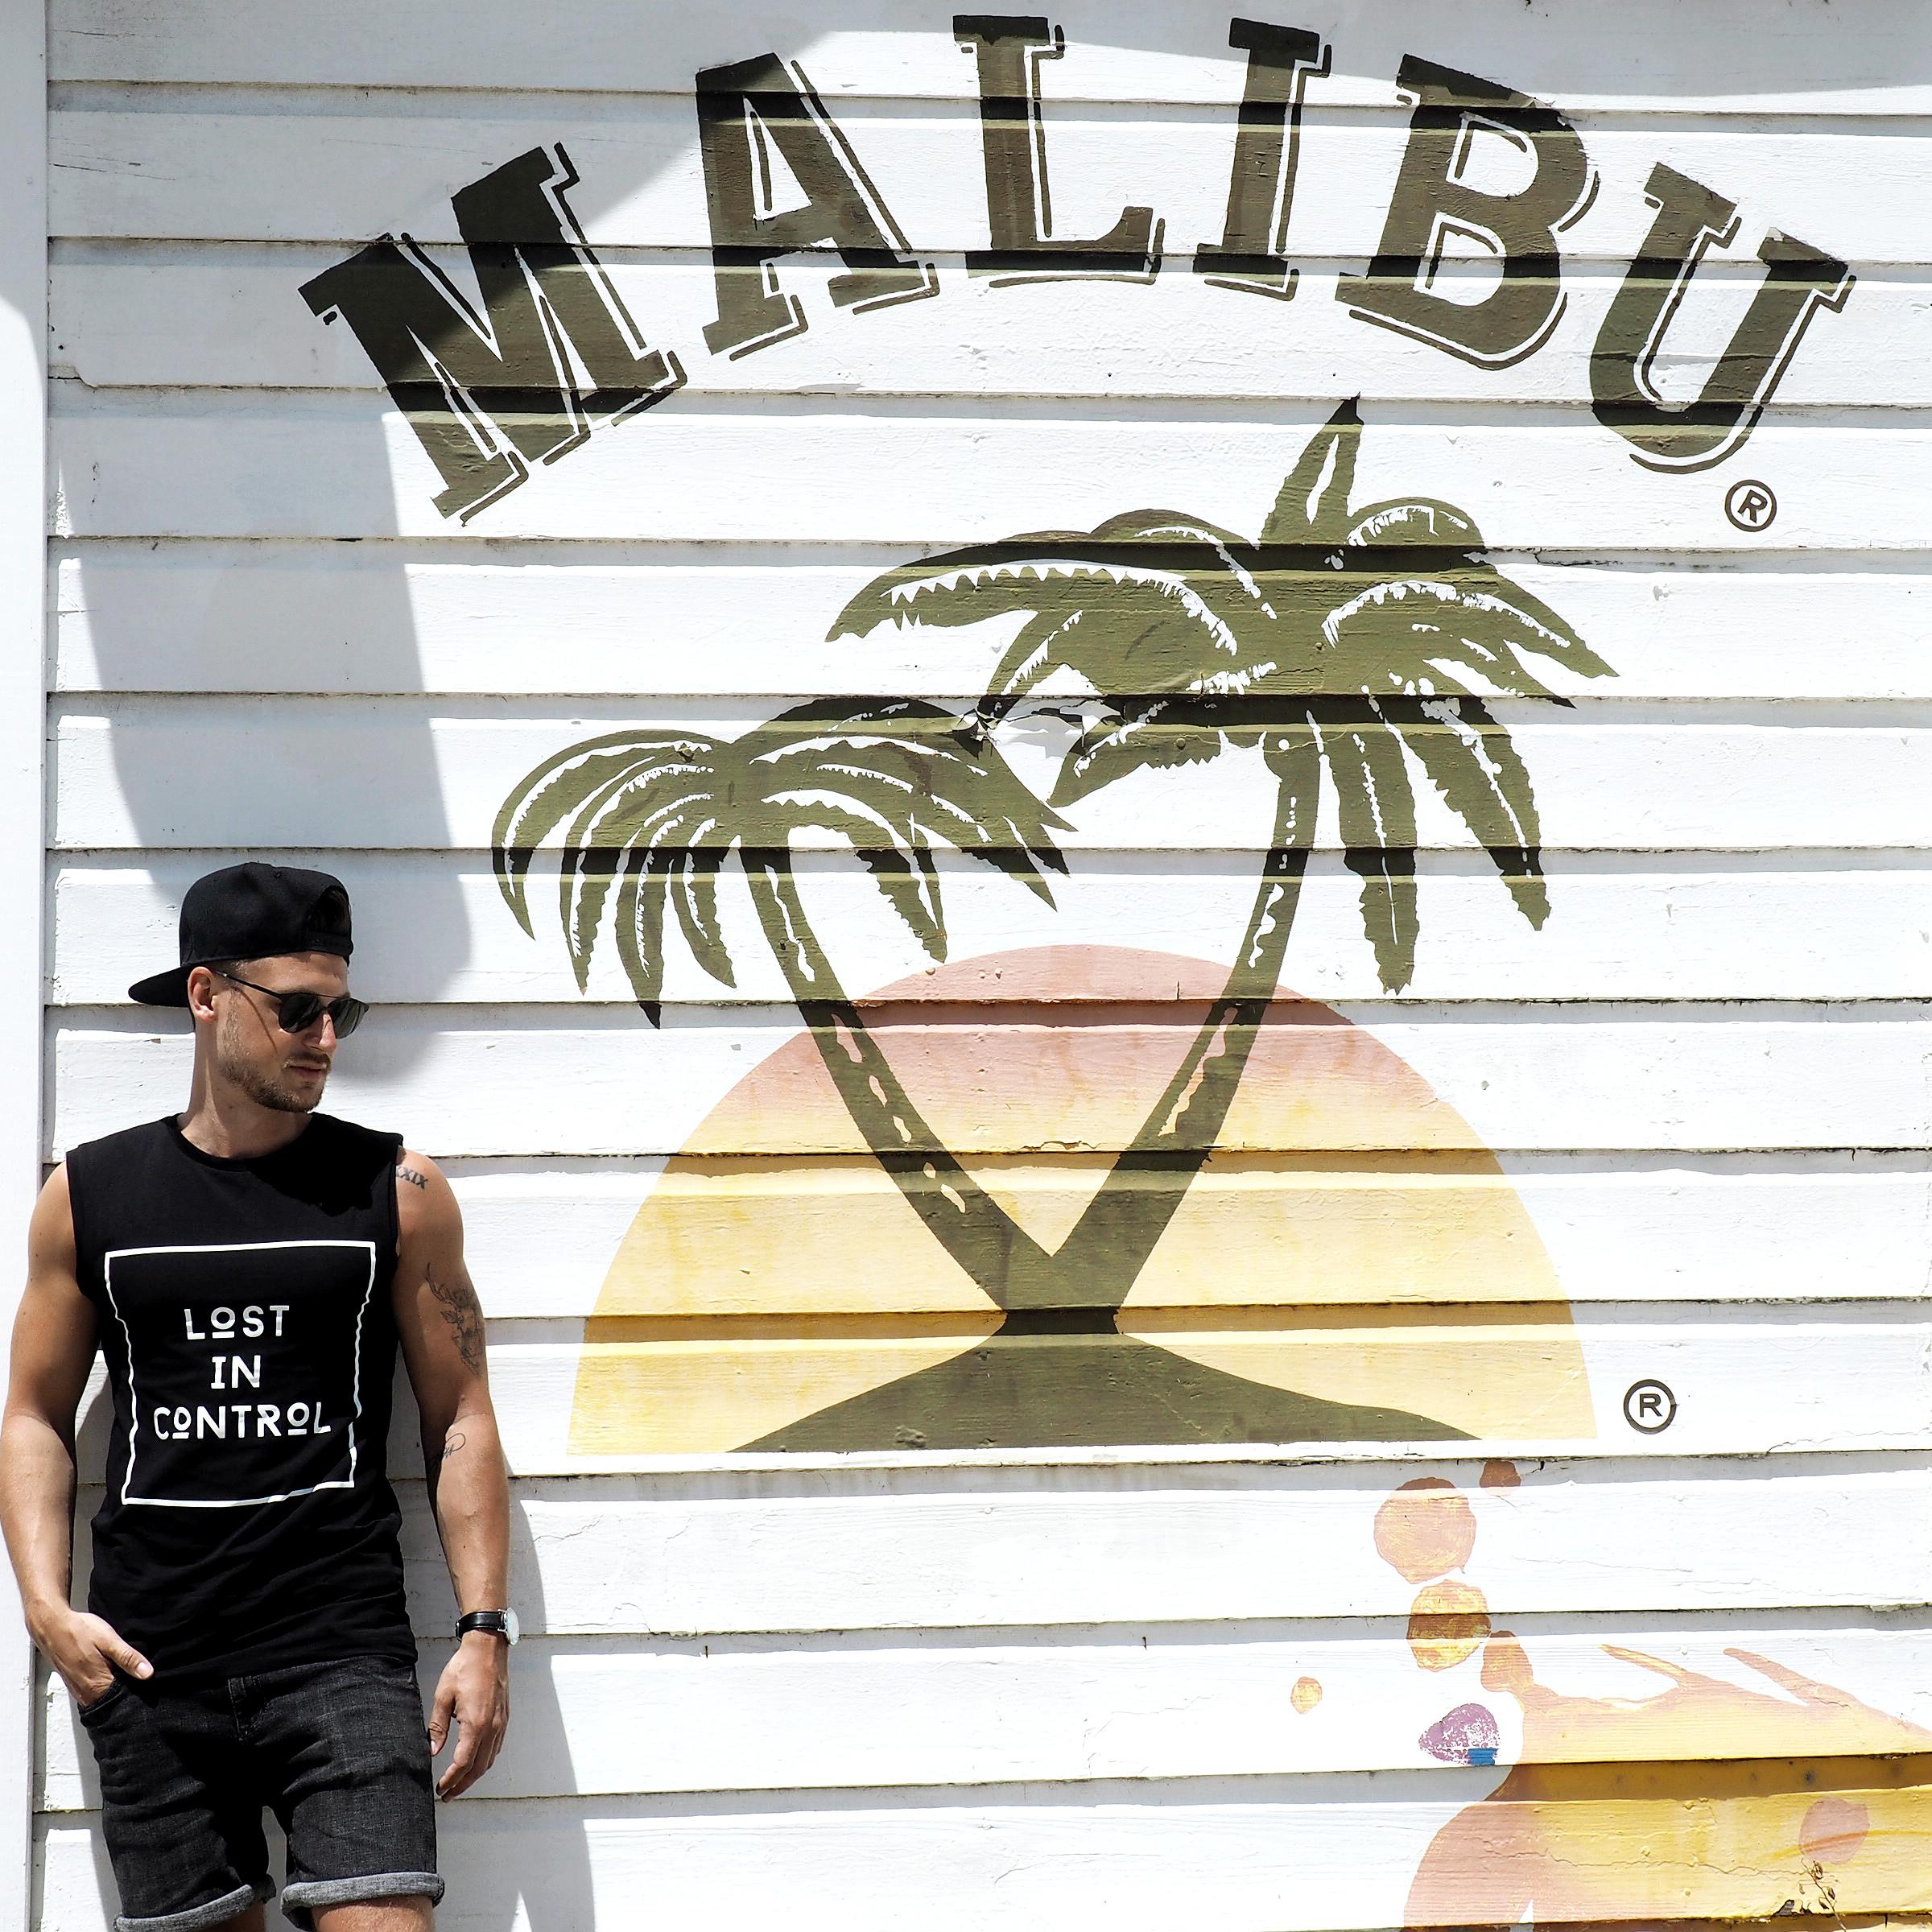 Tommeezjerry-Männerblog-Berlinblog-Fashionblog-Styleblog-Travelblog-Travel-Reiseblog-Reisen-Barbados-Karibik-Carribean-Summer-Sommer-Vacation-15